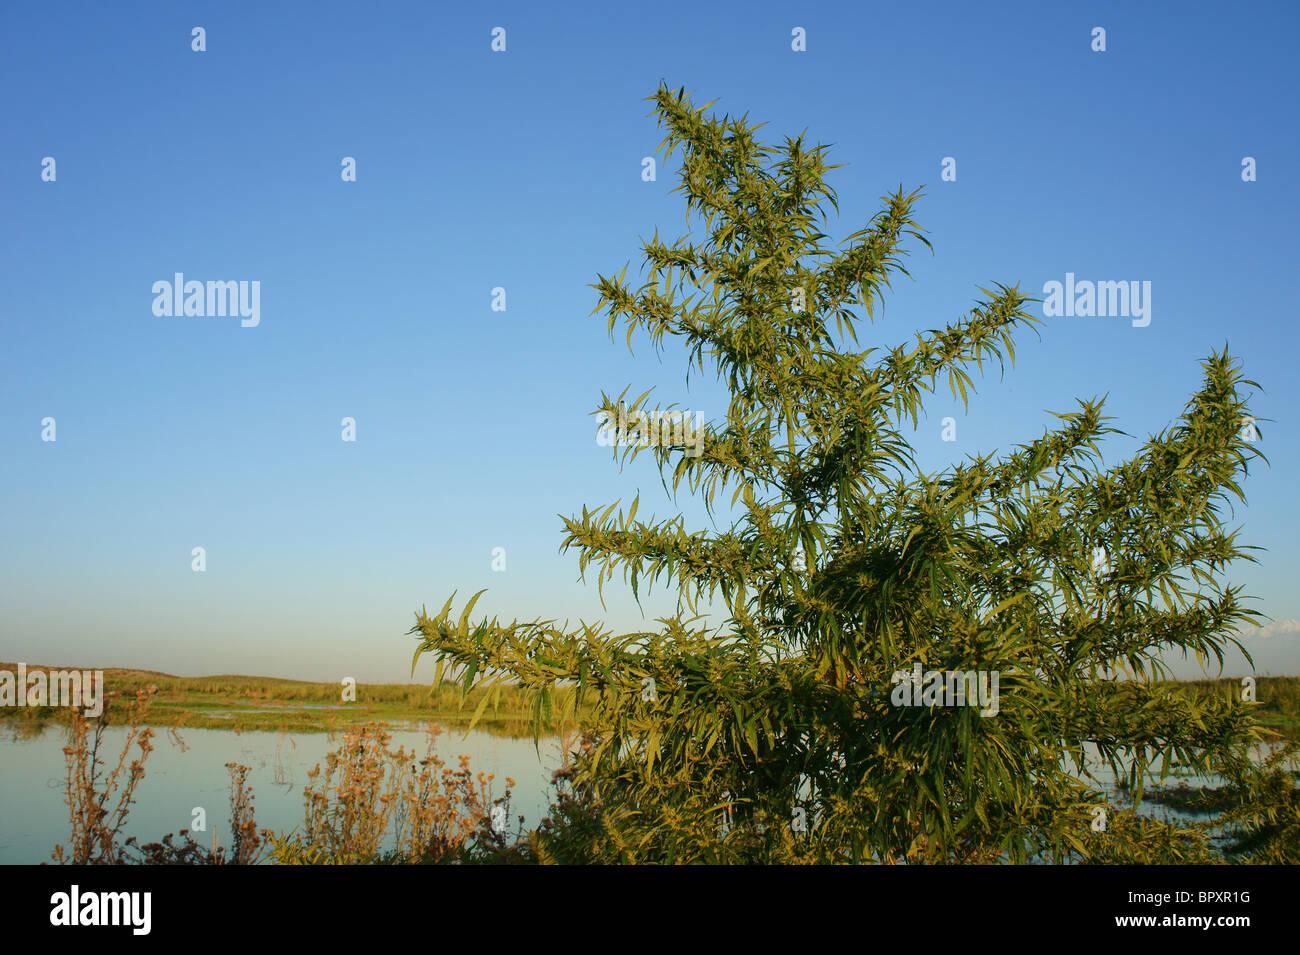 Huge cannabis bush in southern Kazakhstan - Stock Image